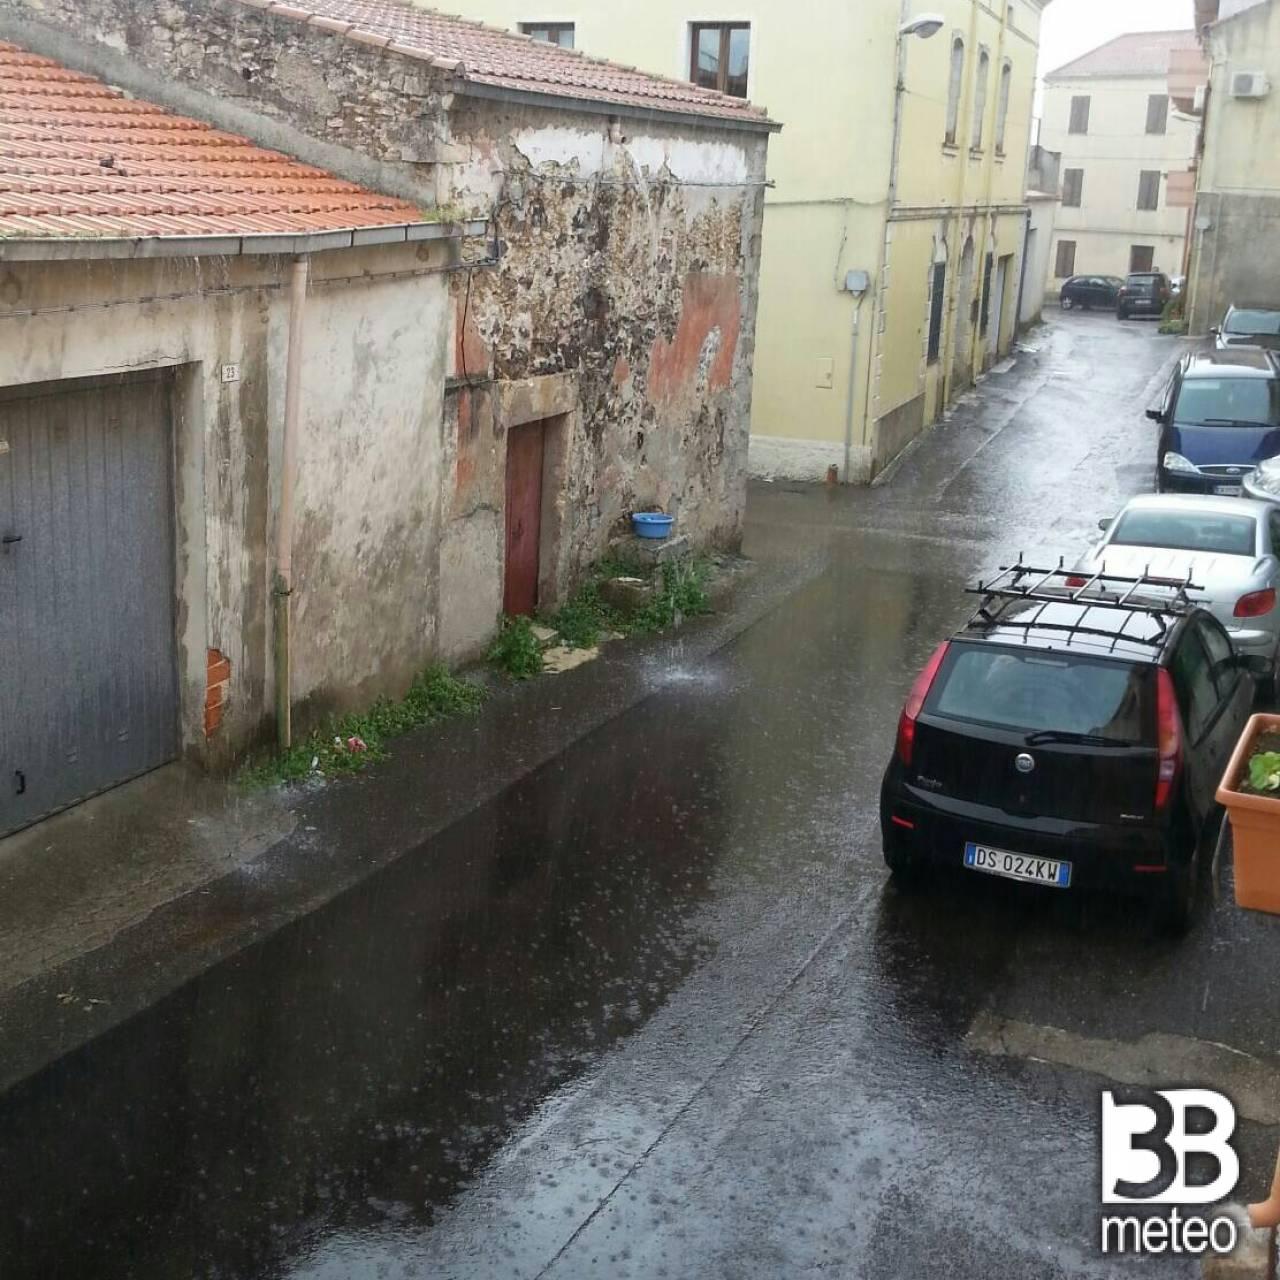 Fotosegnalazione di ploaghe foto gallery 3b meteo - 3b meteo bagno di romagna ...